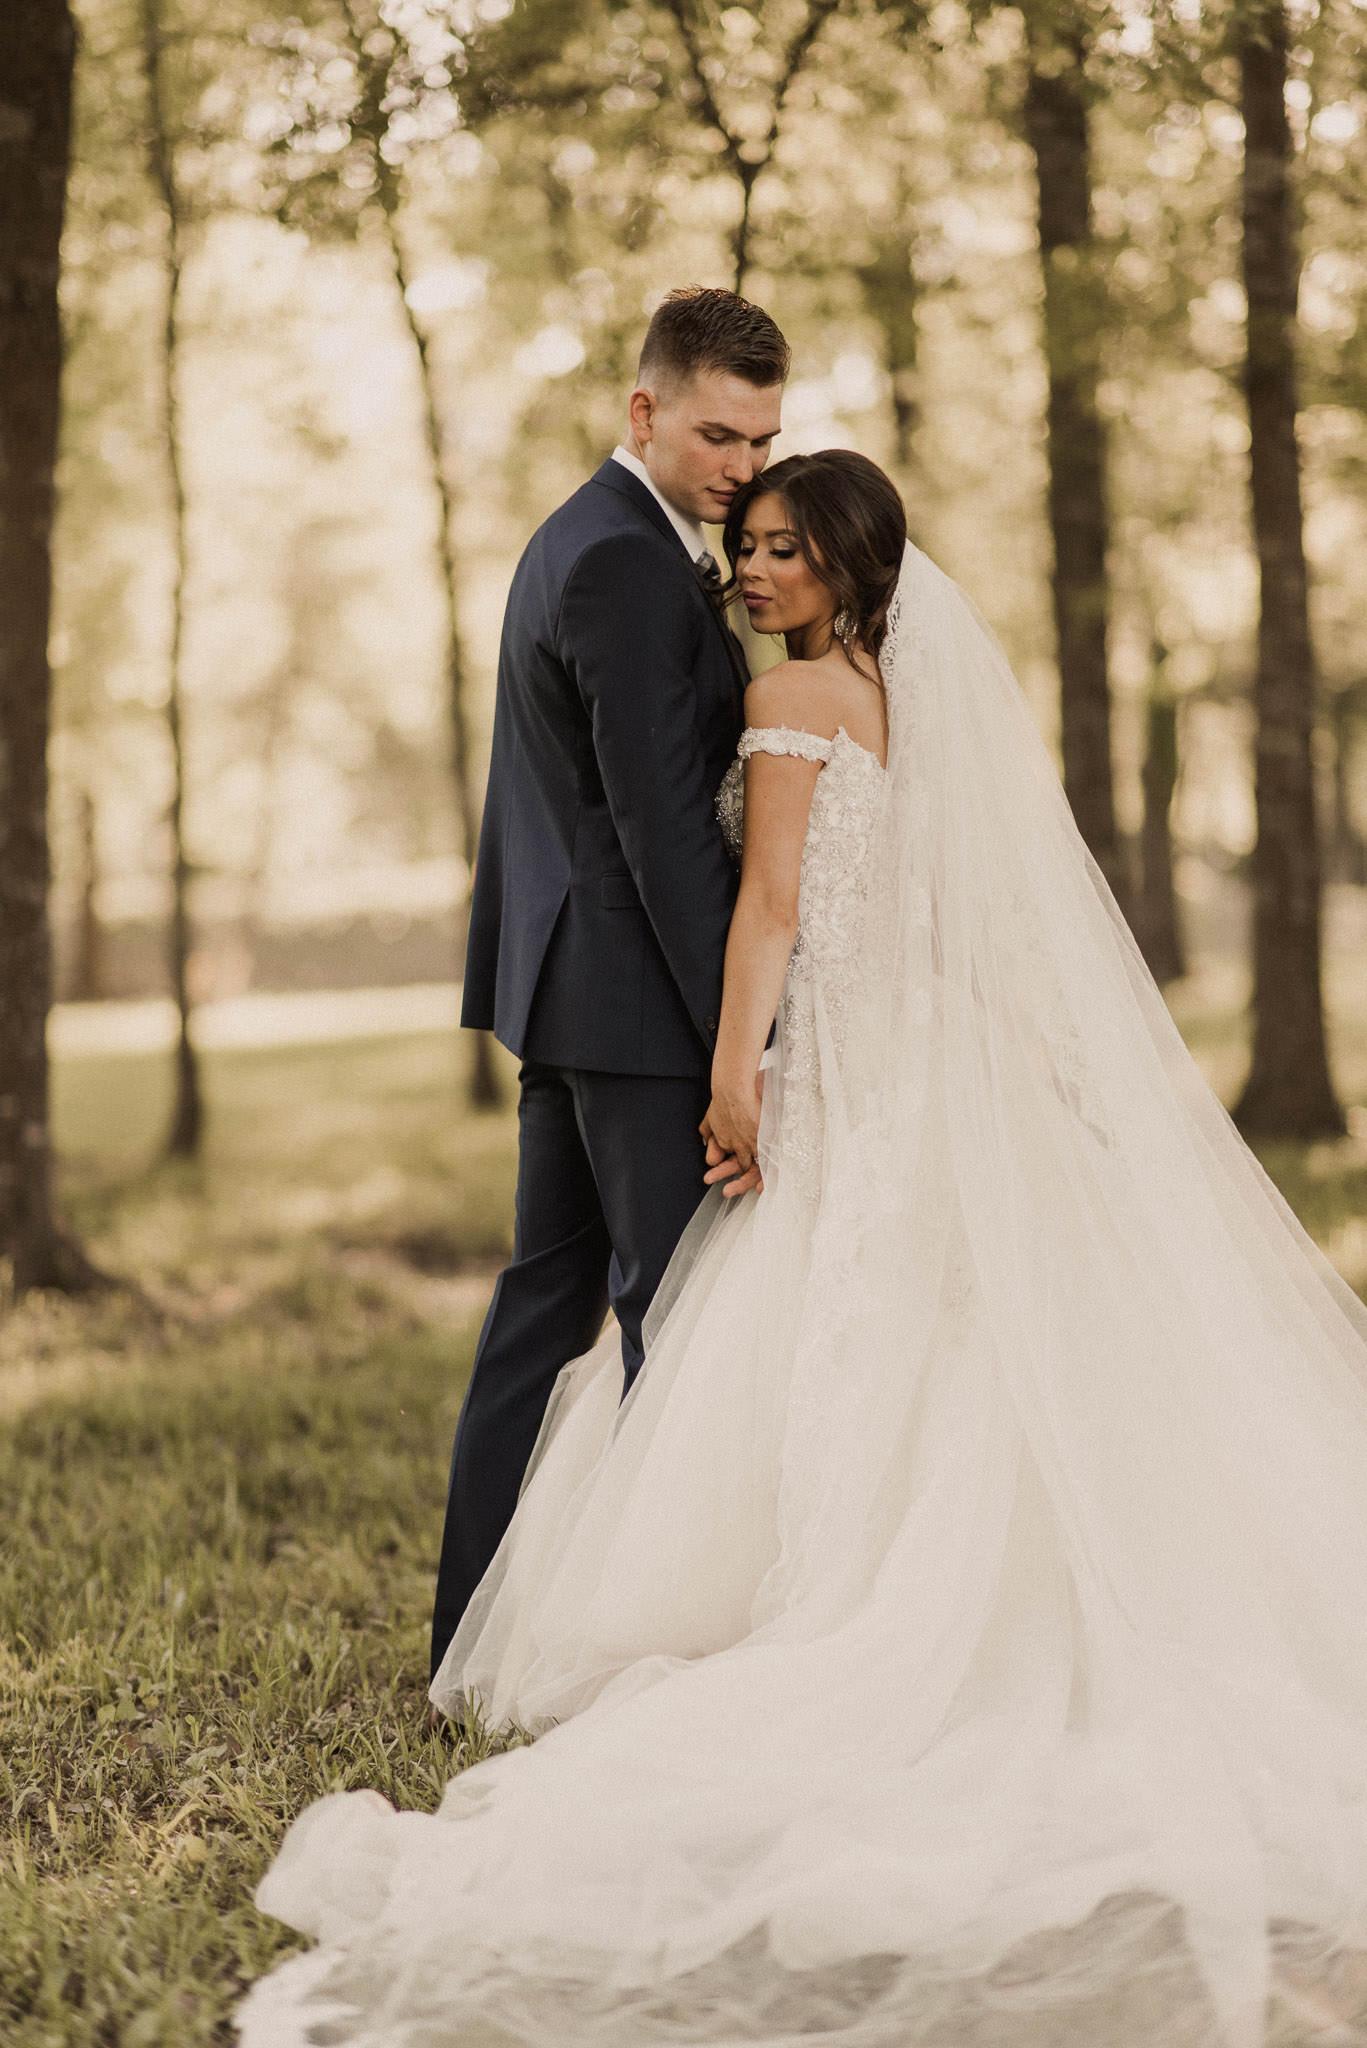 adriana-christian-wedding-re-sm-102.jpg